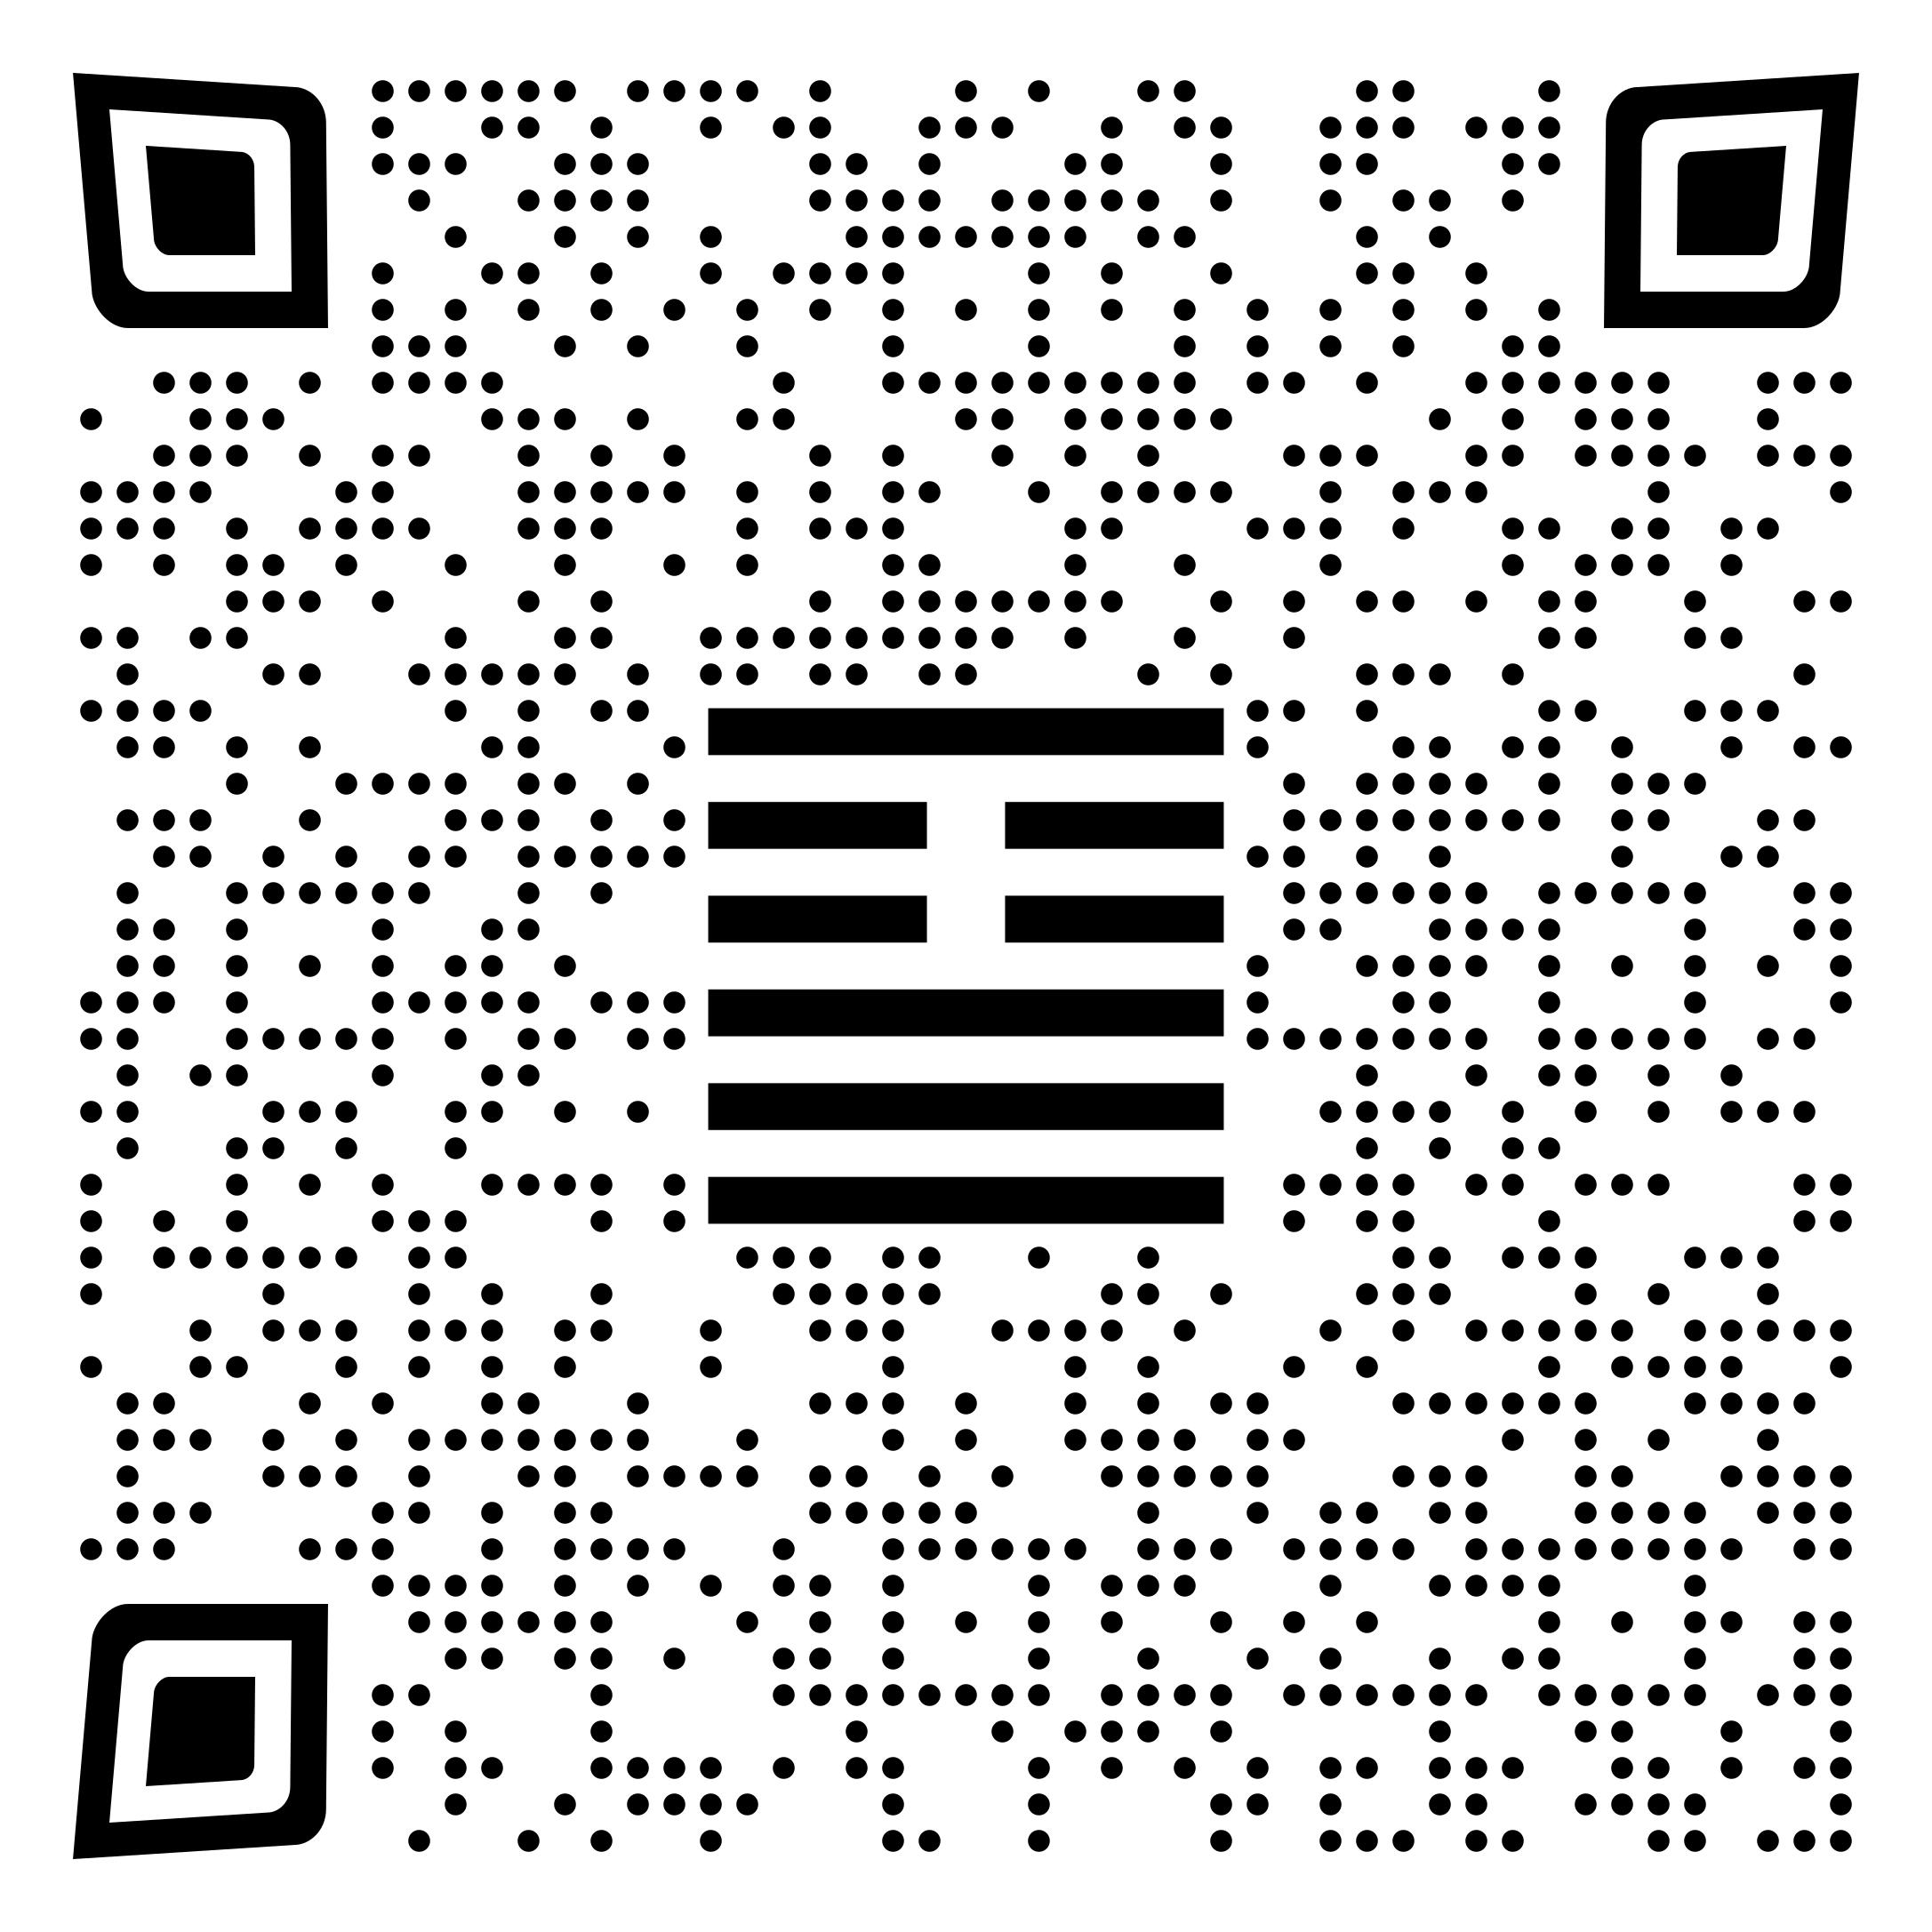 qr-code-26.png